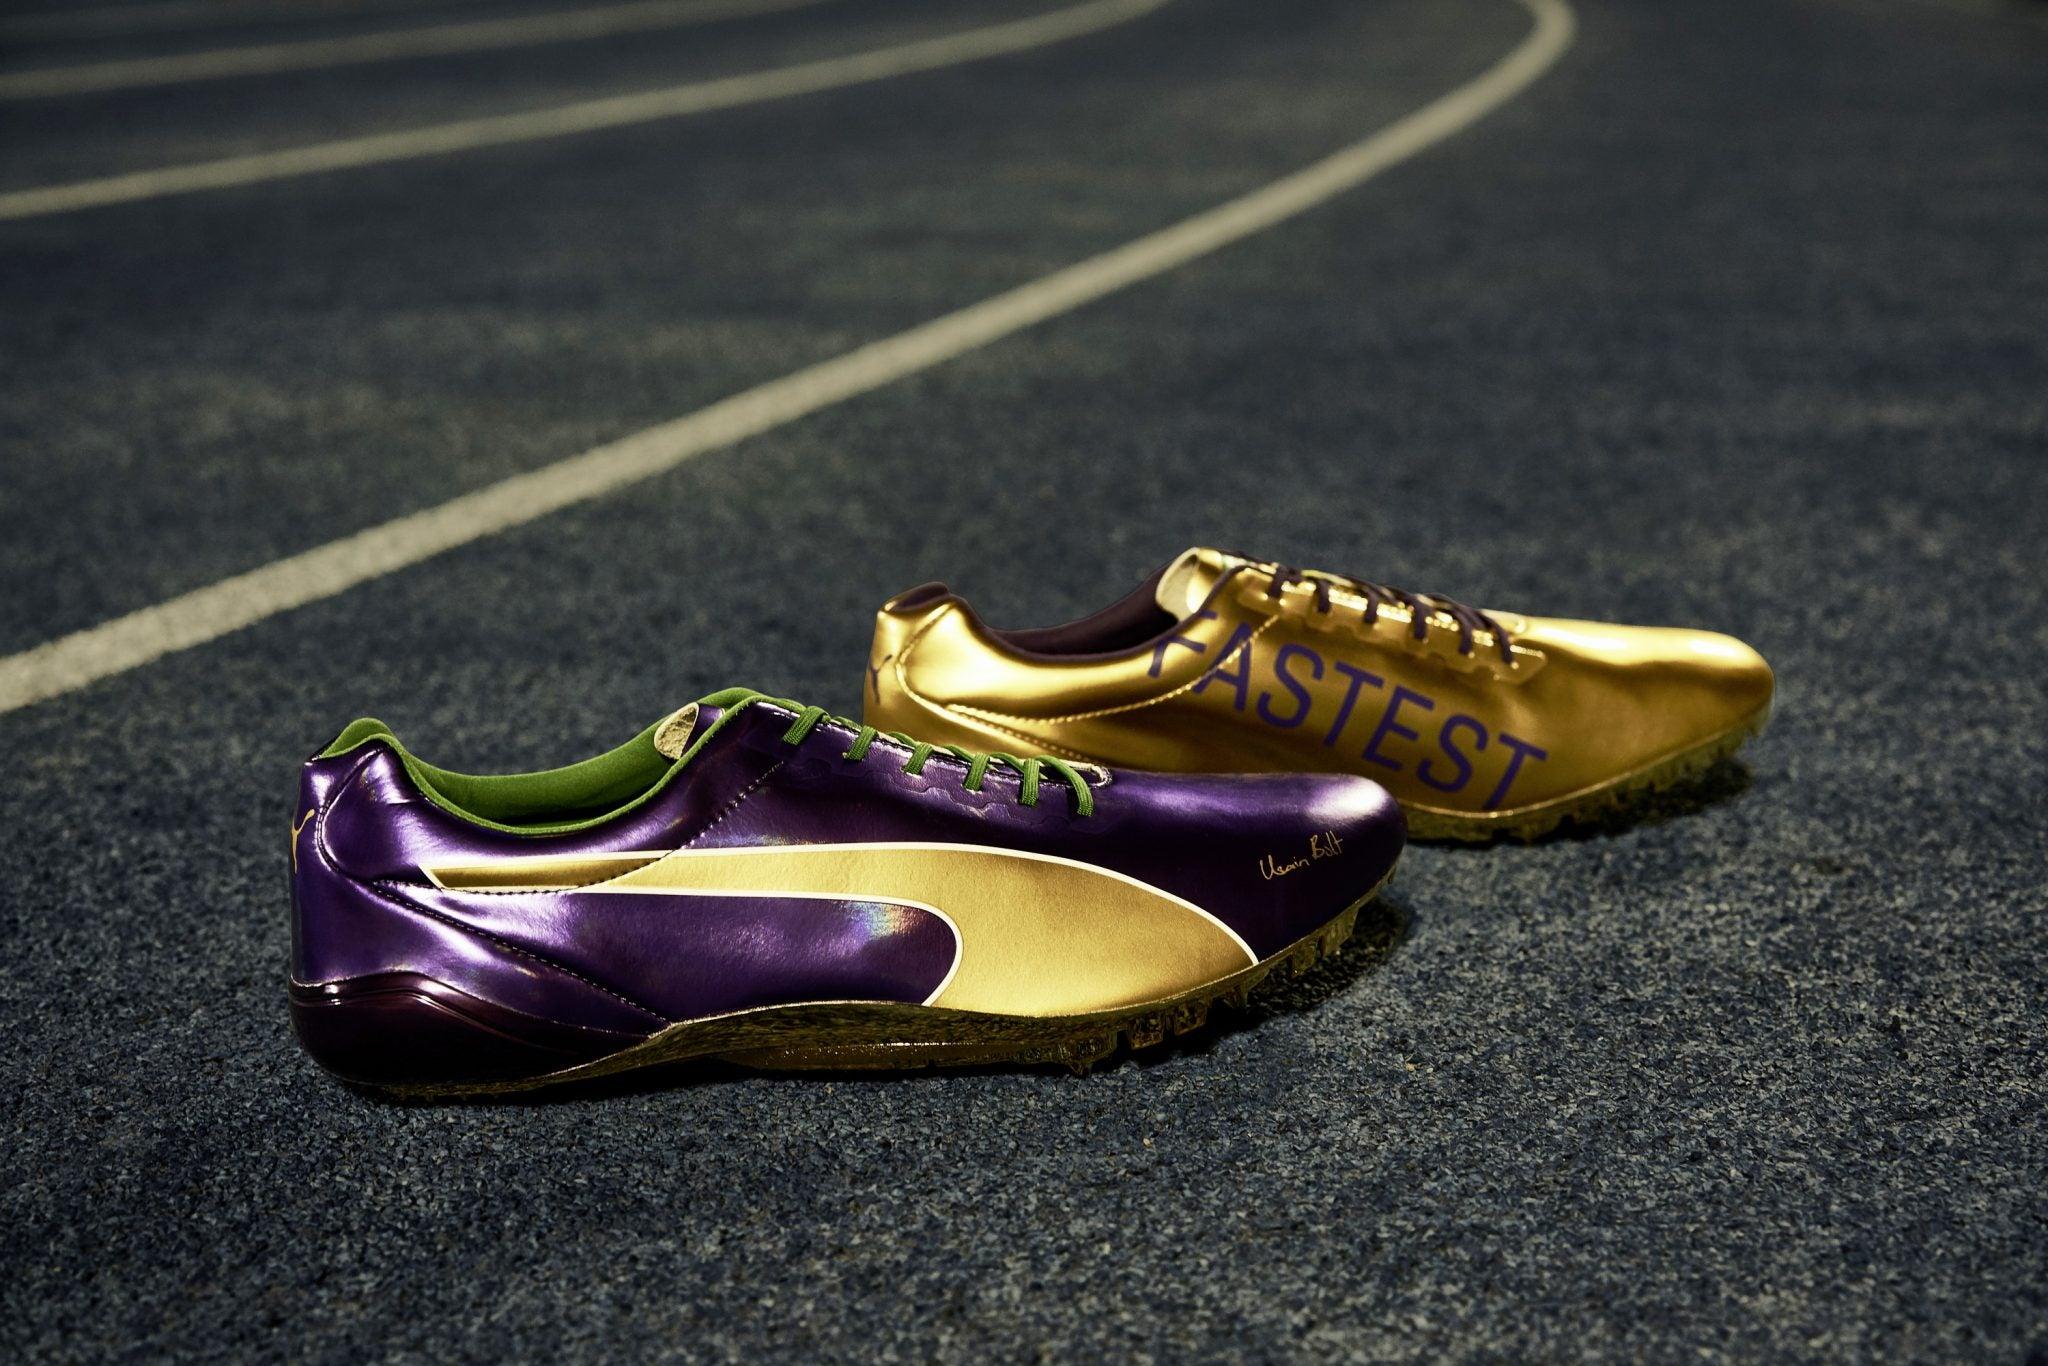 Puma Created Brand New Spikes For Usain